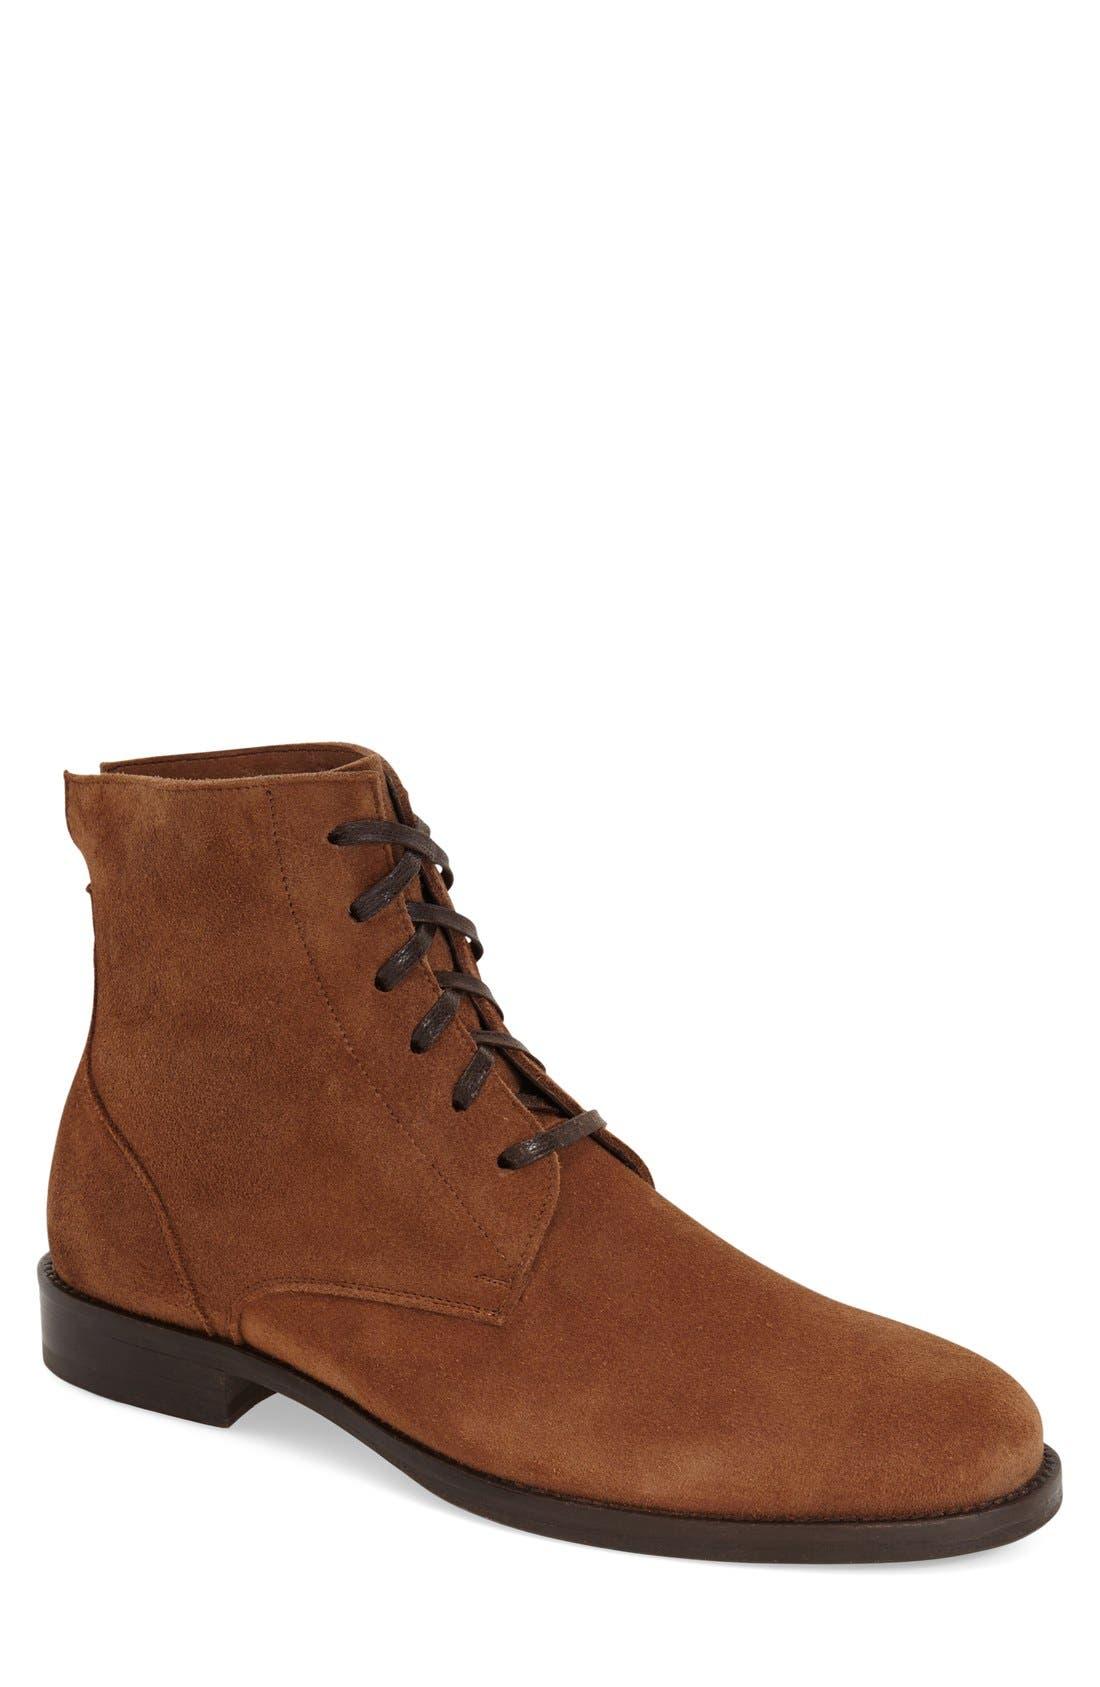 'Stonebreaker' Boot, Main, color, 200